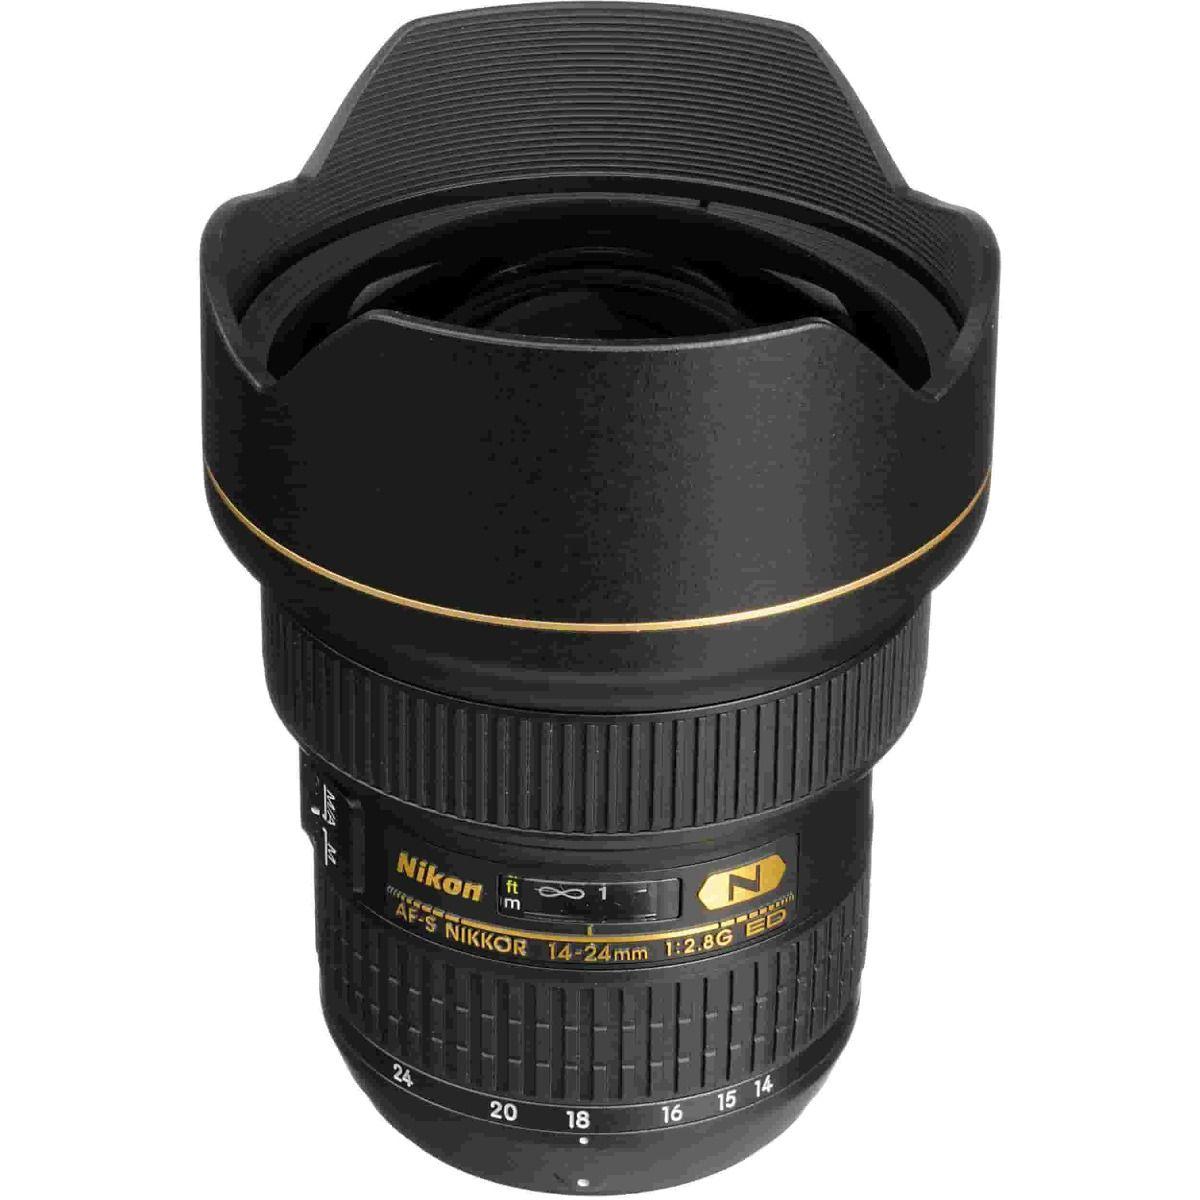 Nikon AF-S 14-24mm f/2.8G ED Lens,Nikon AF-S 14-24mm f/2.8G ED Lens,Nikon AF-S 14-24mm f/2.8G ED Lens